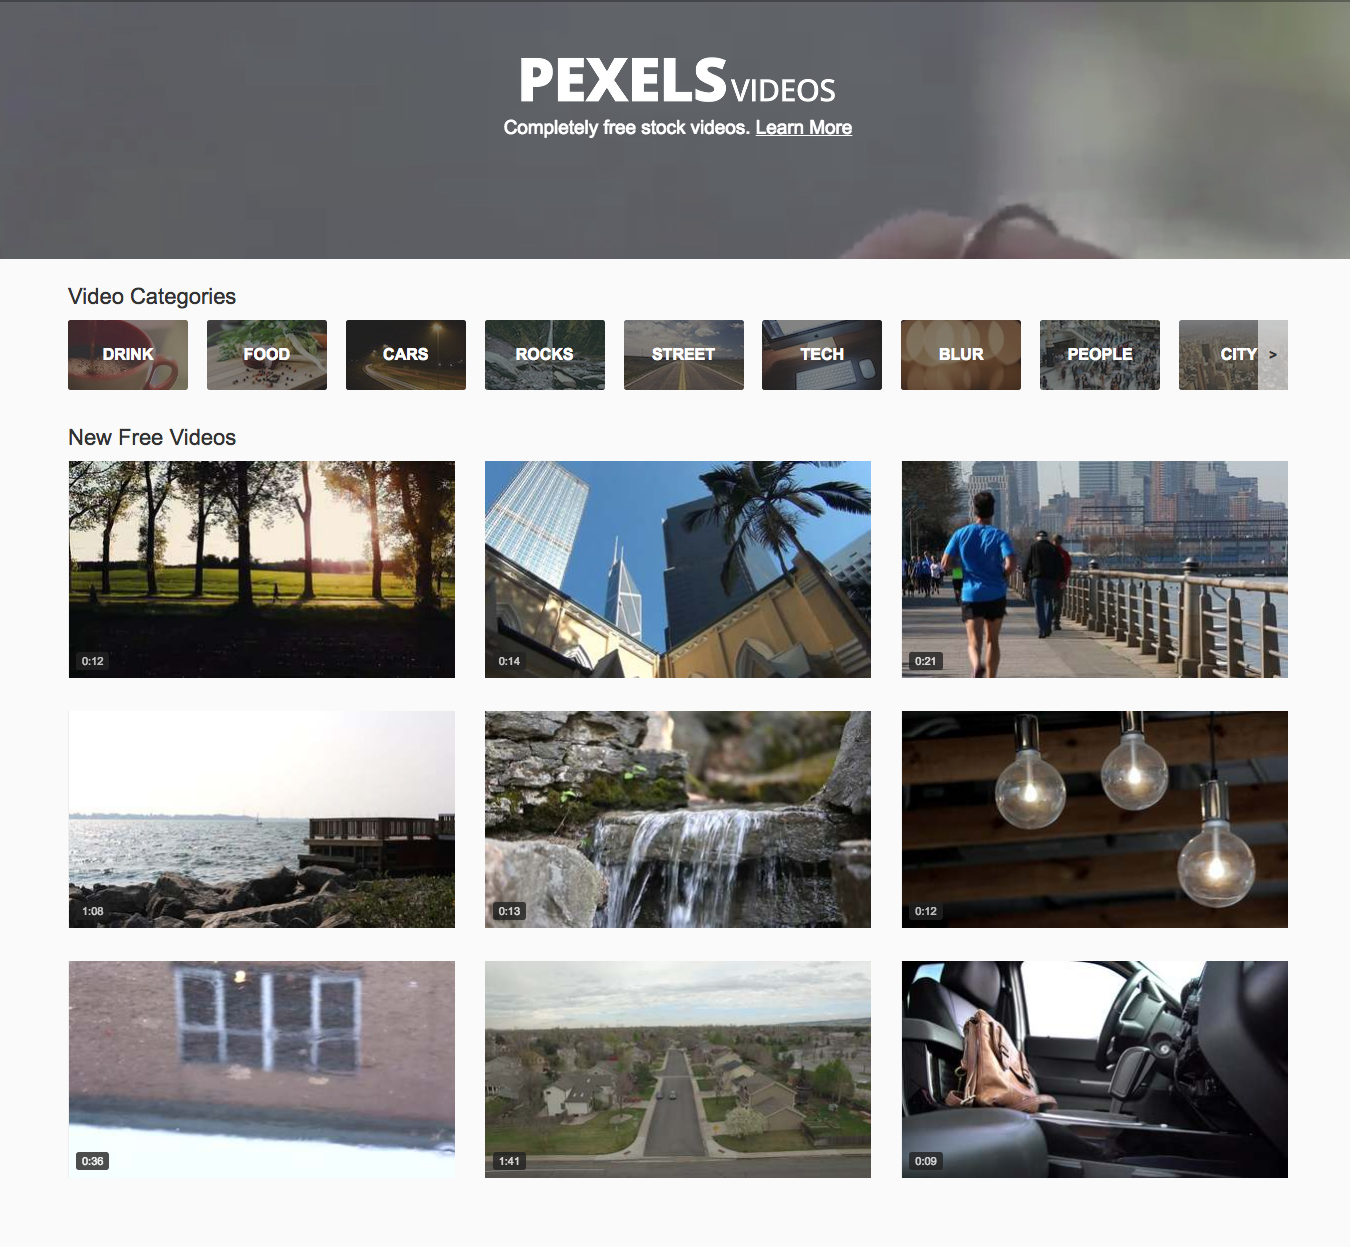 pexels recursos videos stock